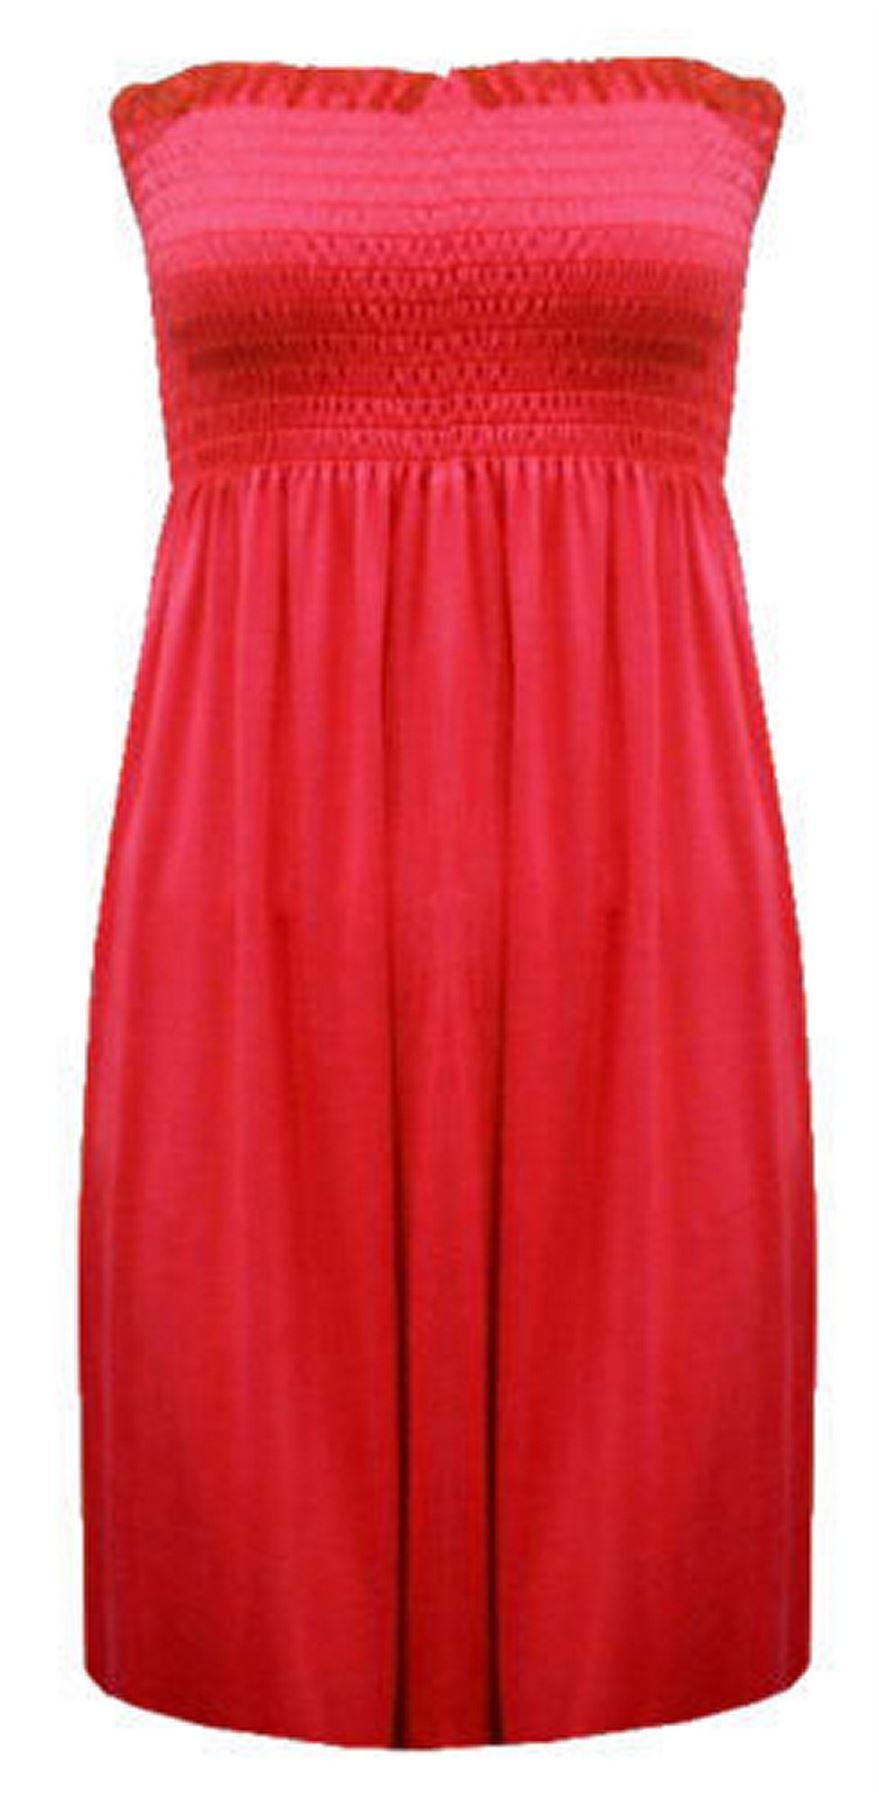 New-Ladies-Bandeau-Boob-Gathering-Tops-Boob-Tube-Beach-Wear-Tunics-8-26 thumbnail 62